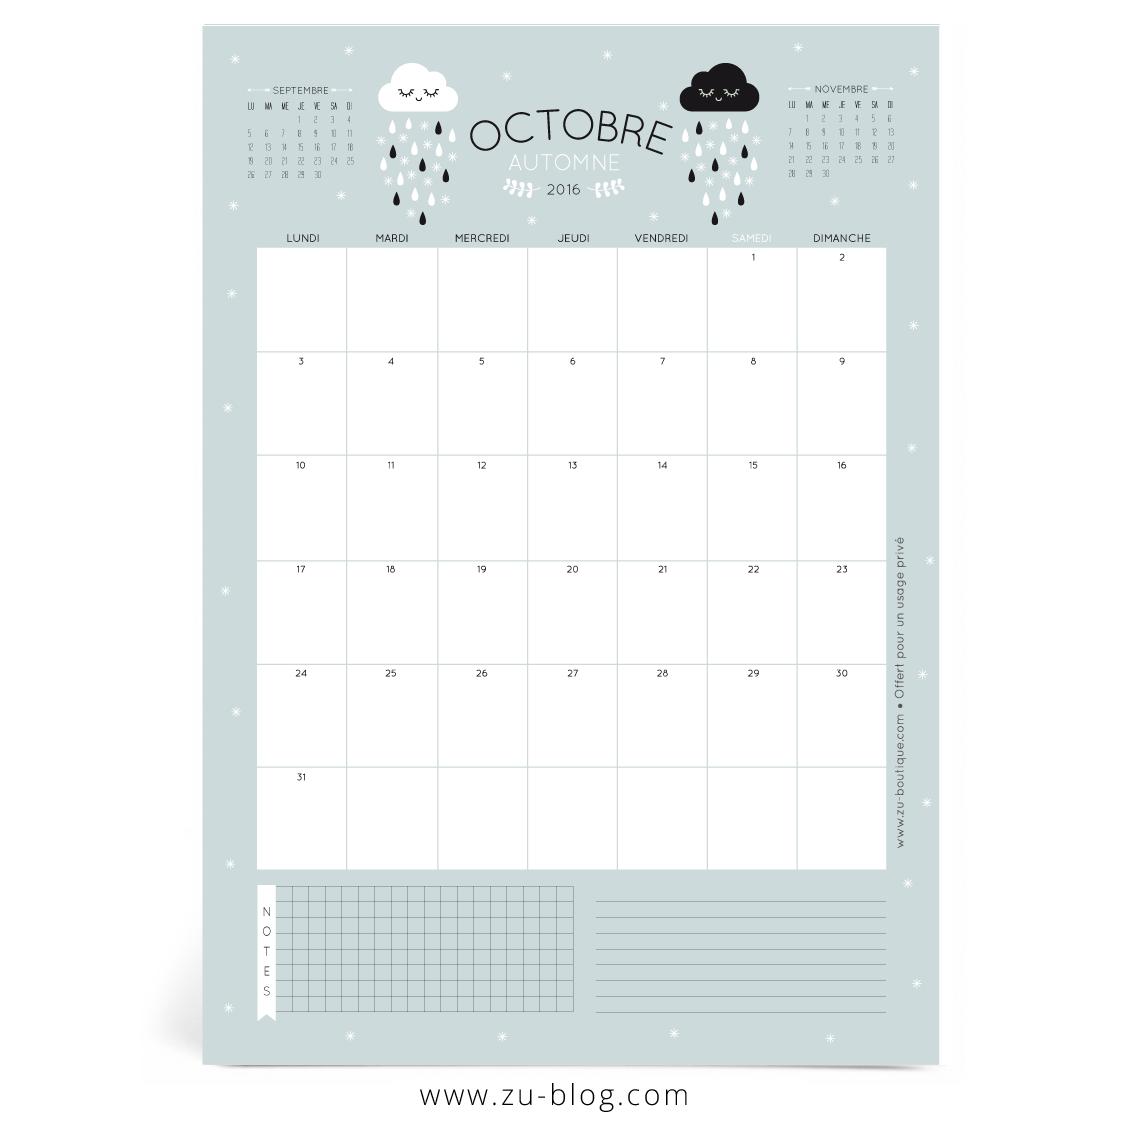 Le calendrier diy octobre 2016 z le blog - Calendrier lune octobre 2017 ...